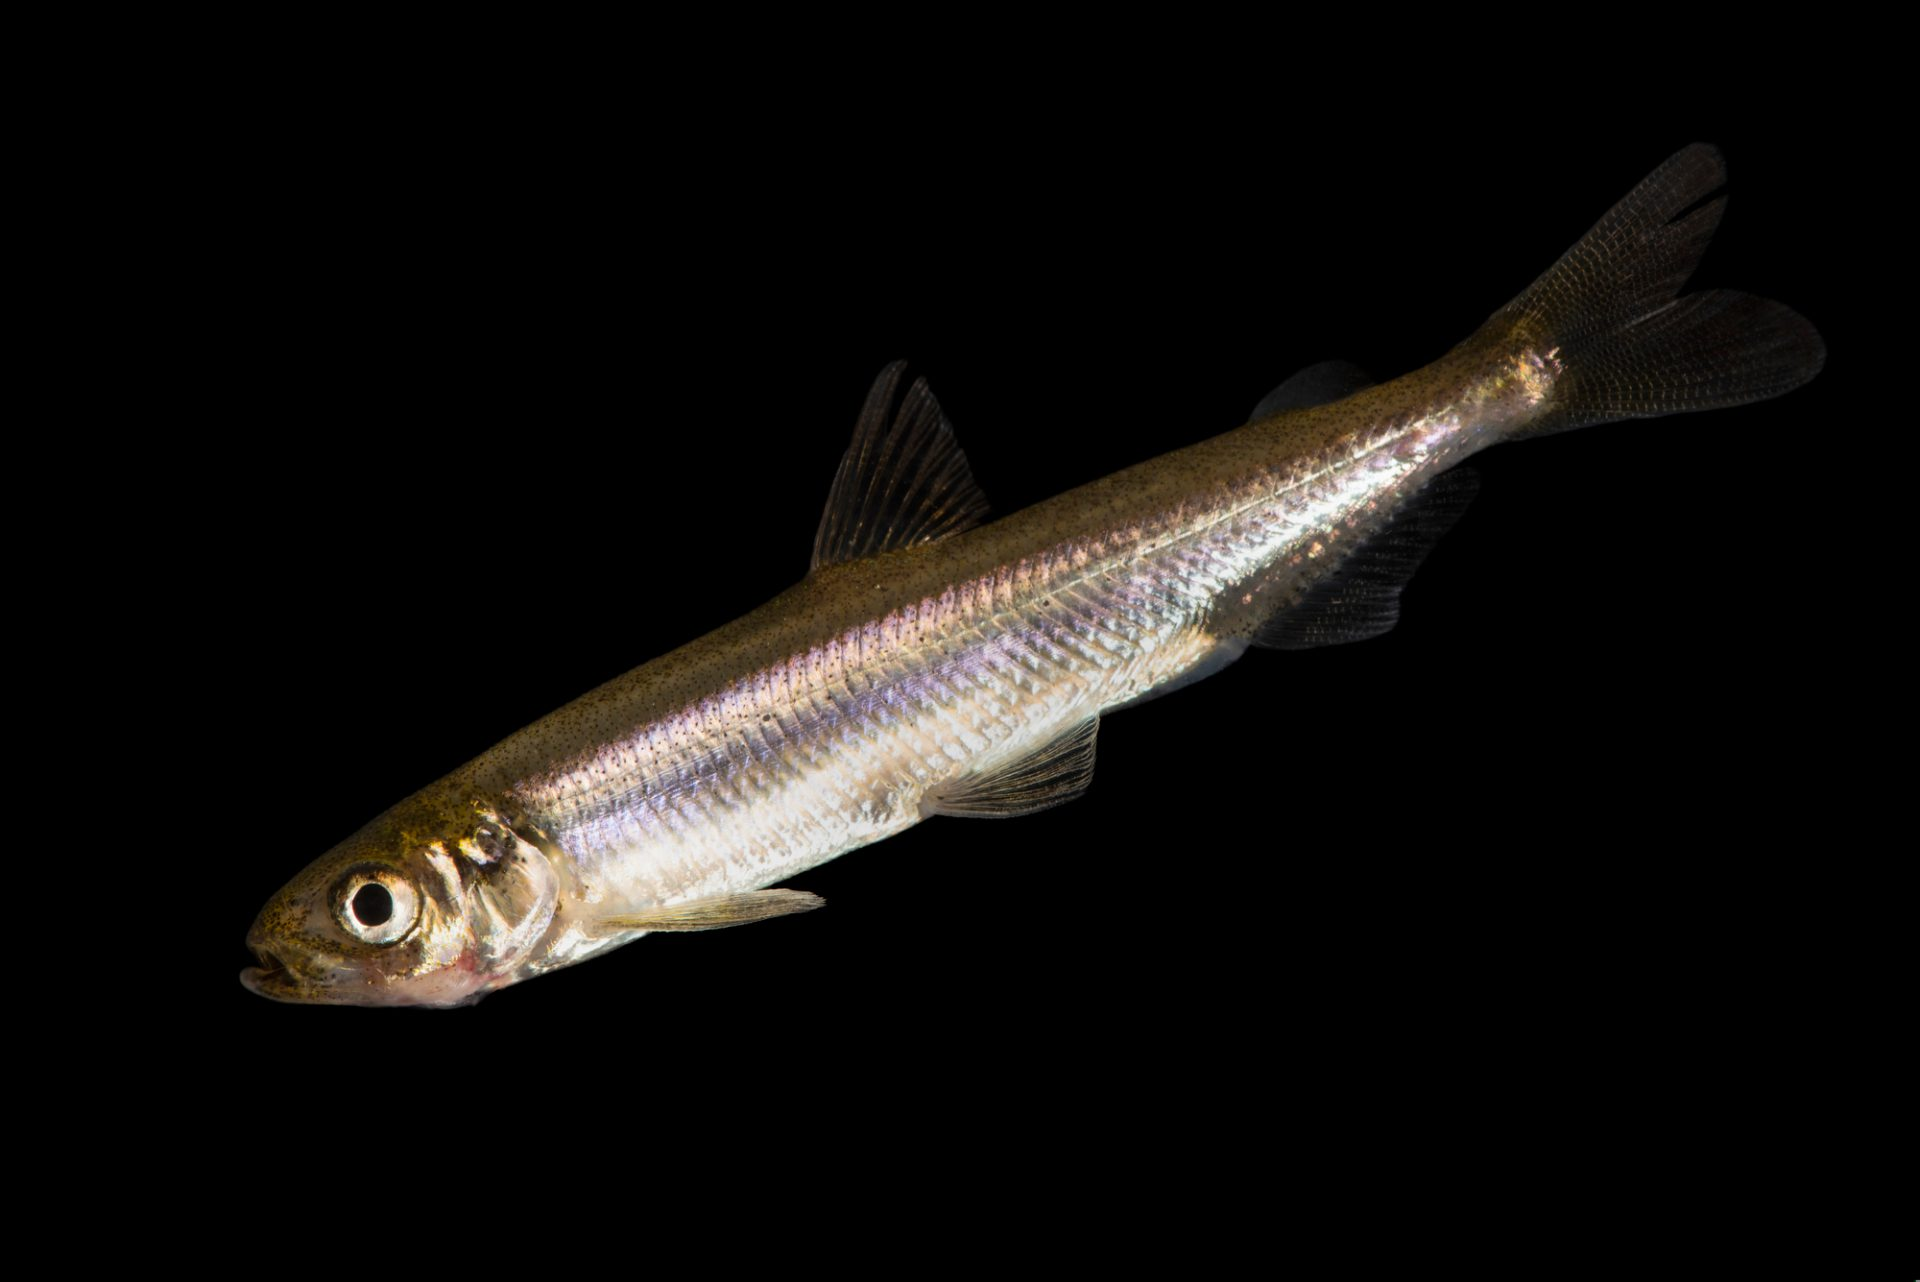 Photo: A critically endangered Delta smelt (Hypomesus transpacificus) at the University of California, Davis.